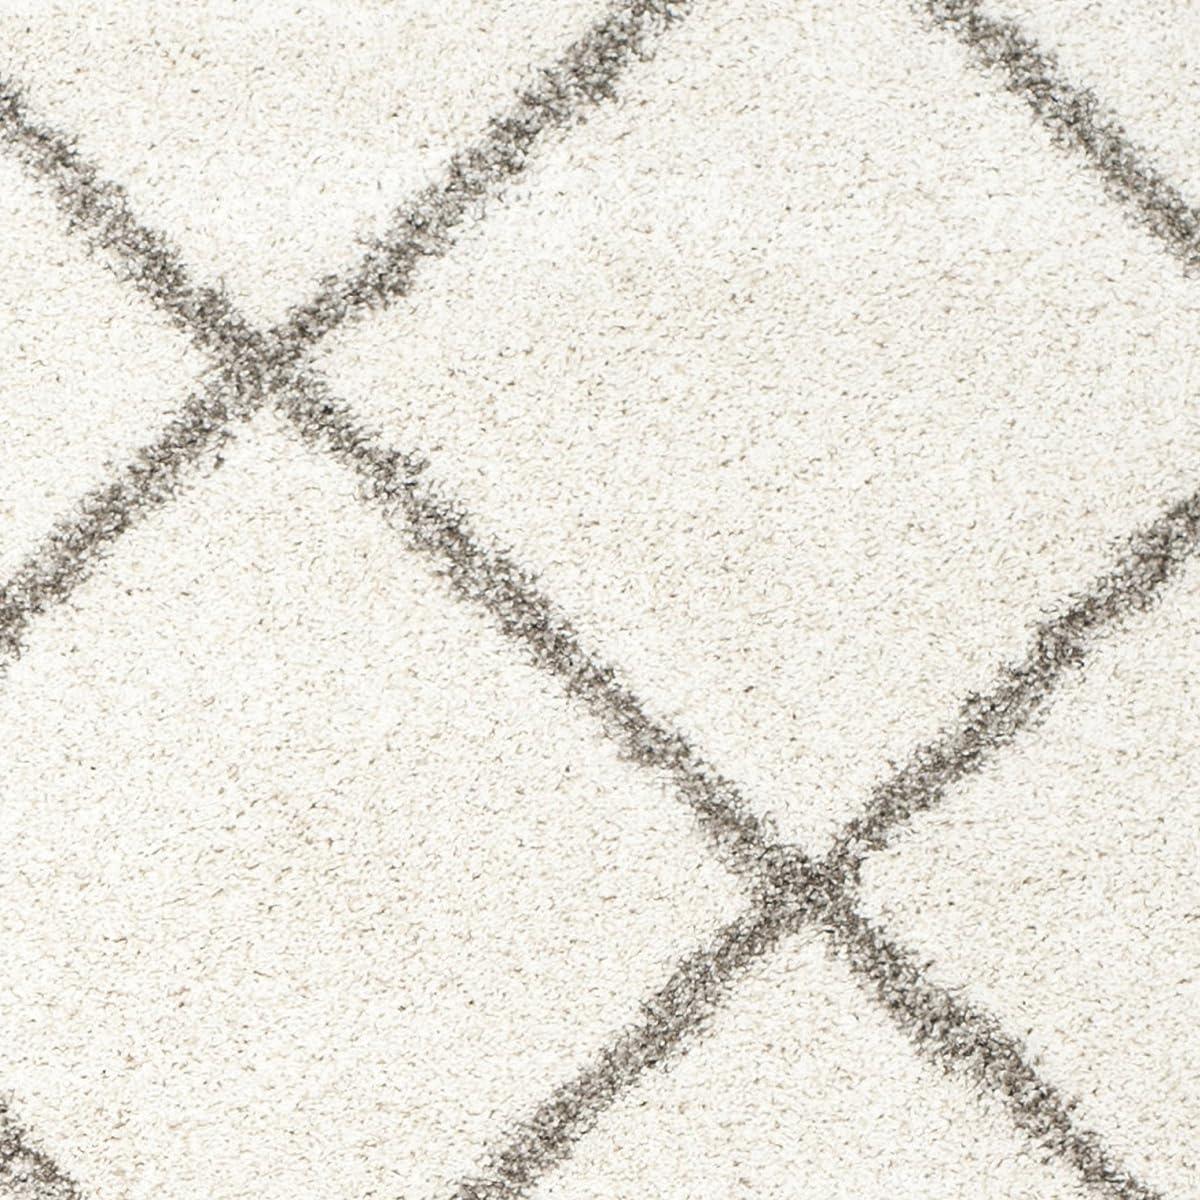 Safavieh Hudson Shag Collection SGH281A Ivory and Grey Moroccan Diamond Trellis Area Rug (8 x 10)